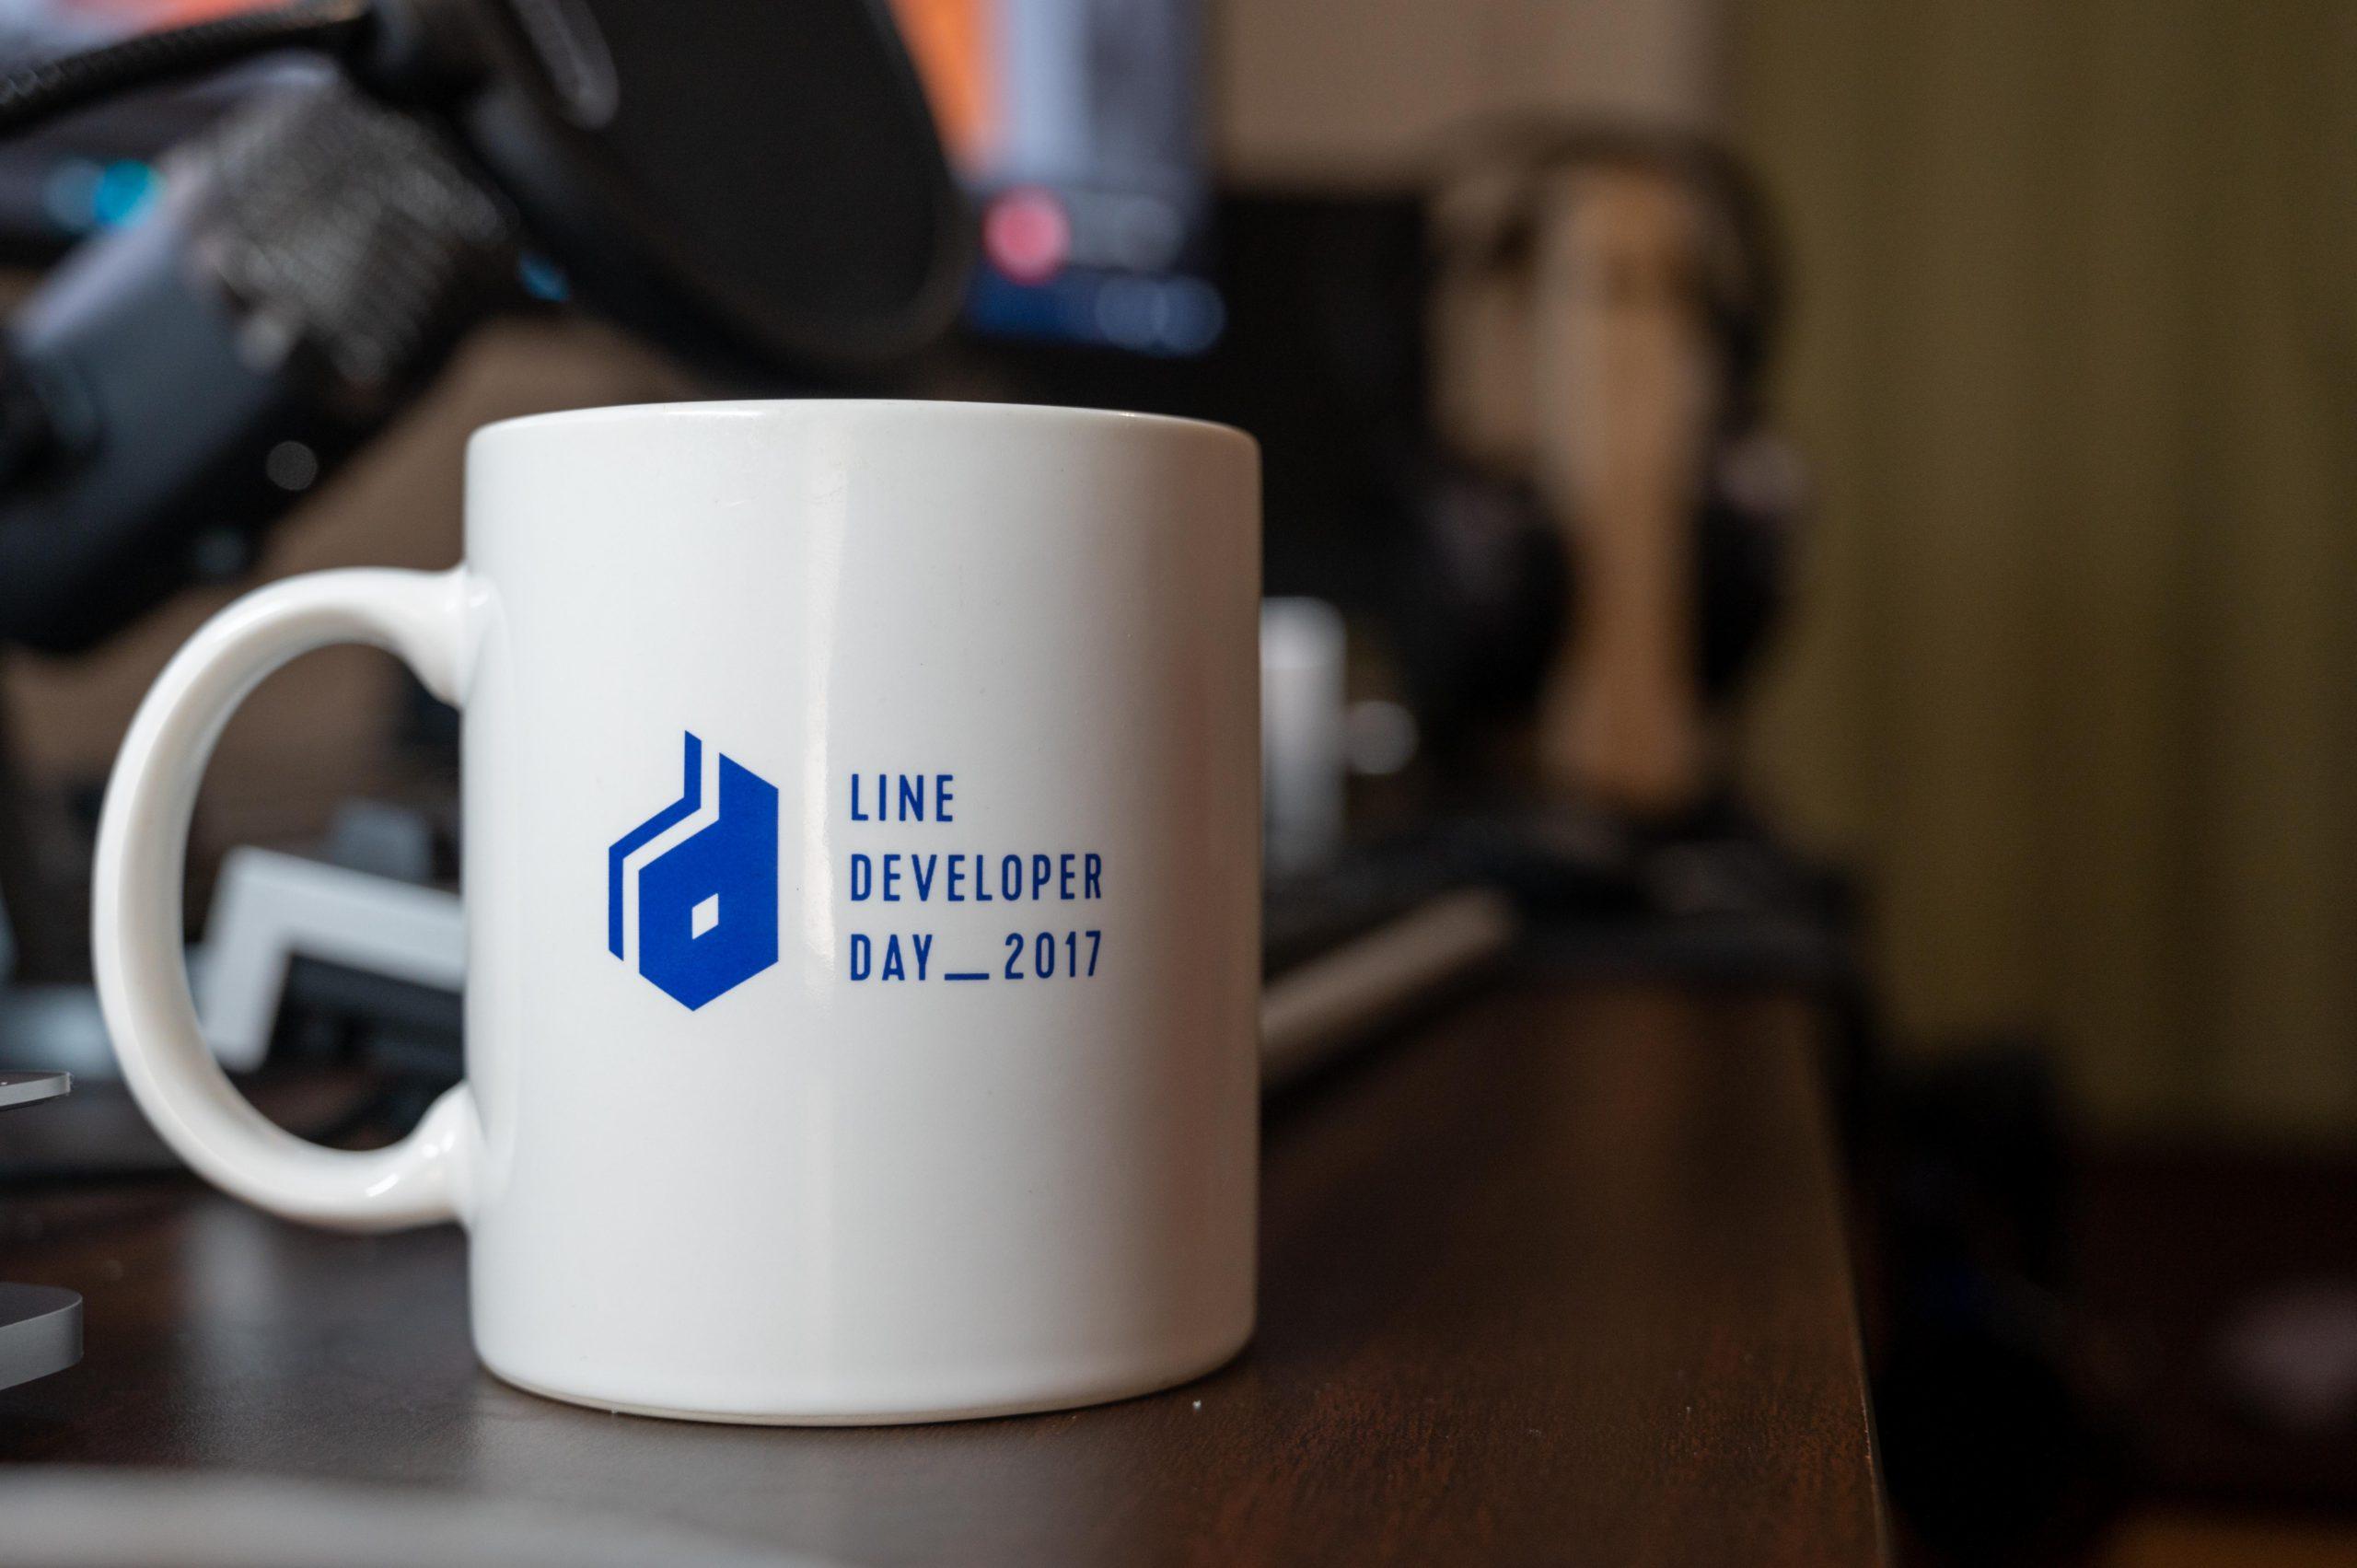 LINE Dev Day Mug